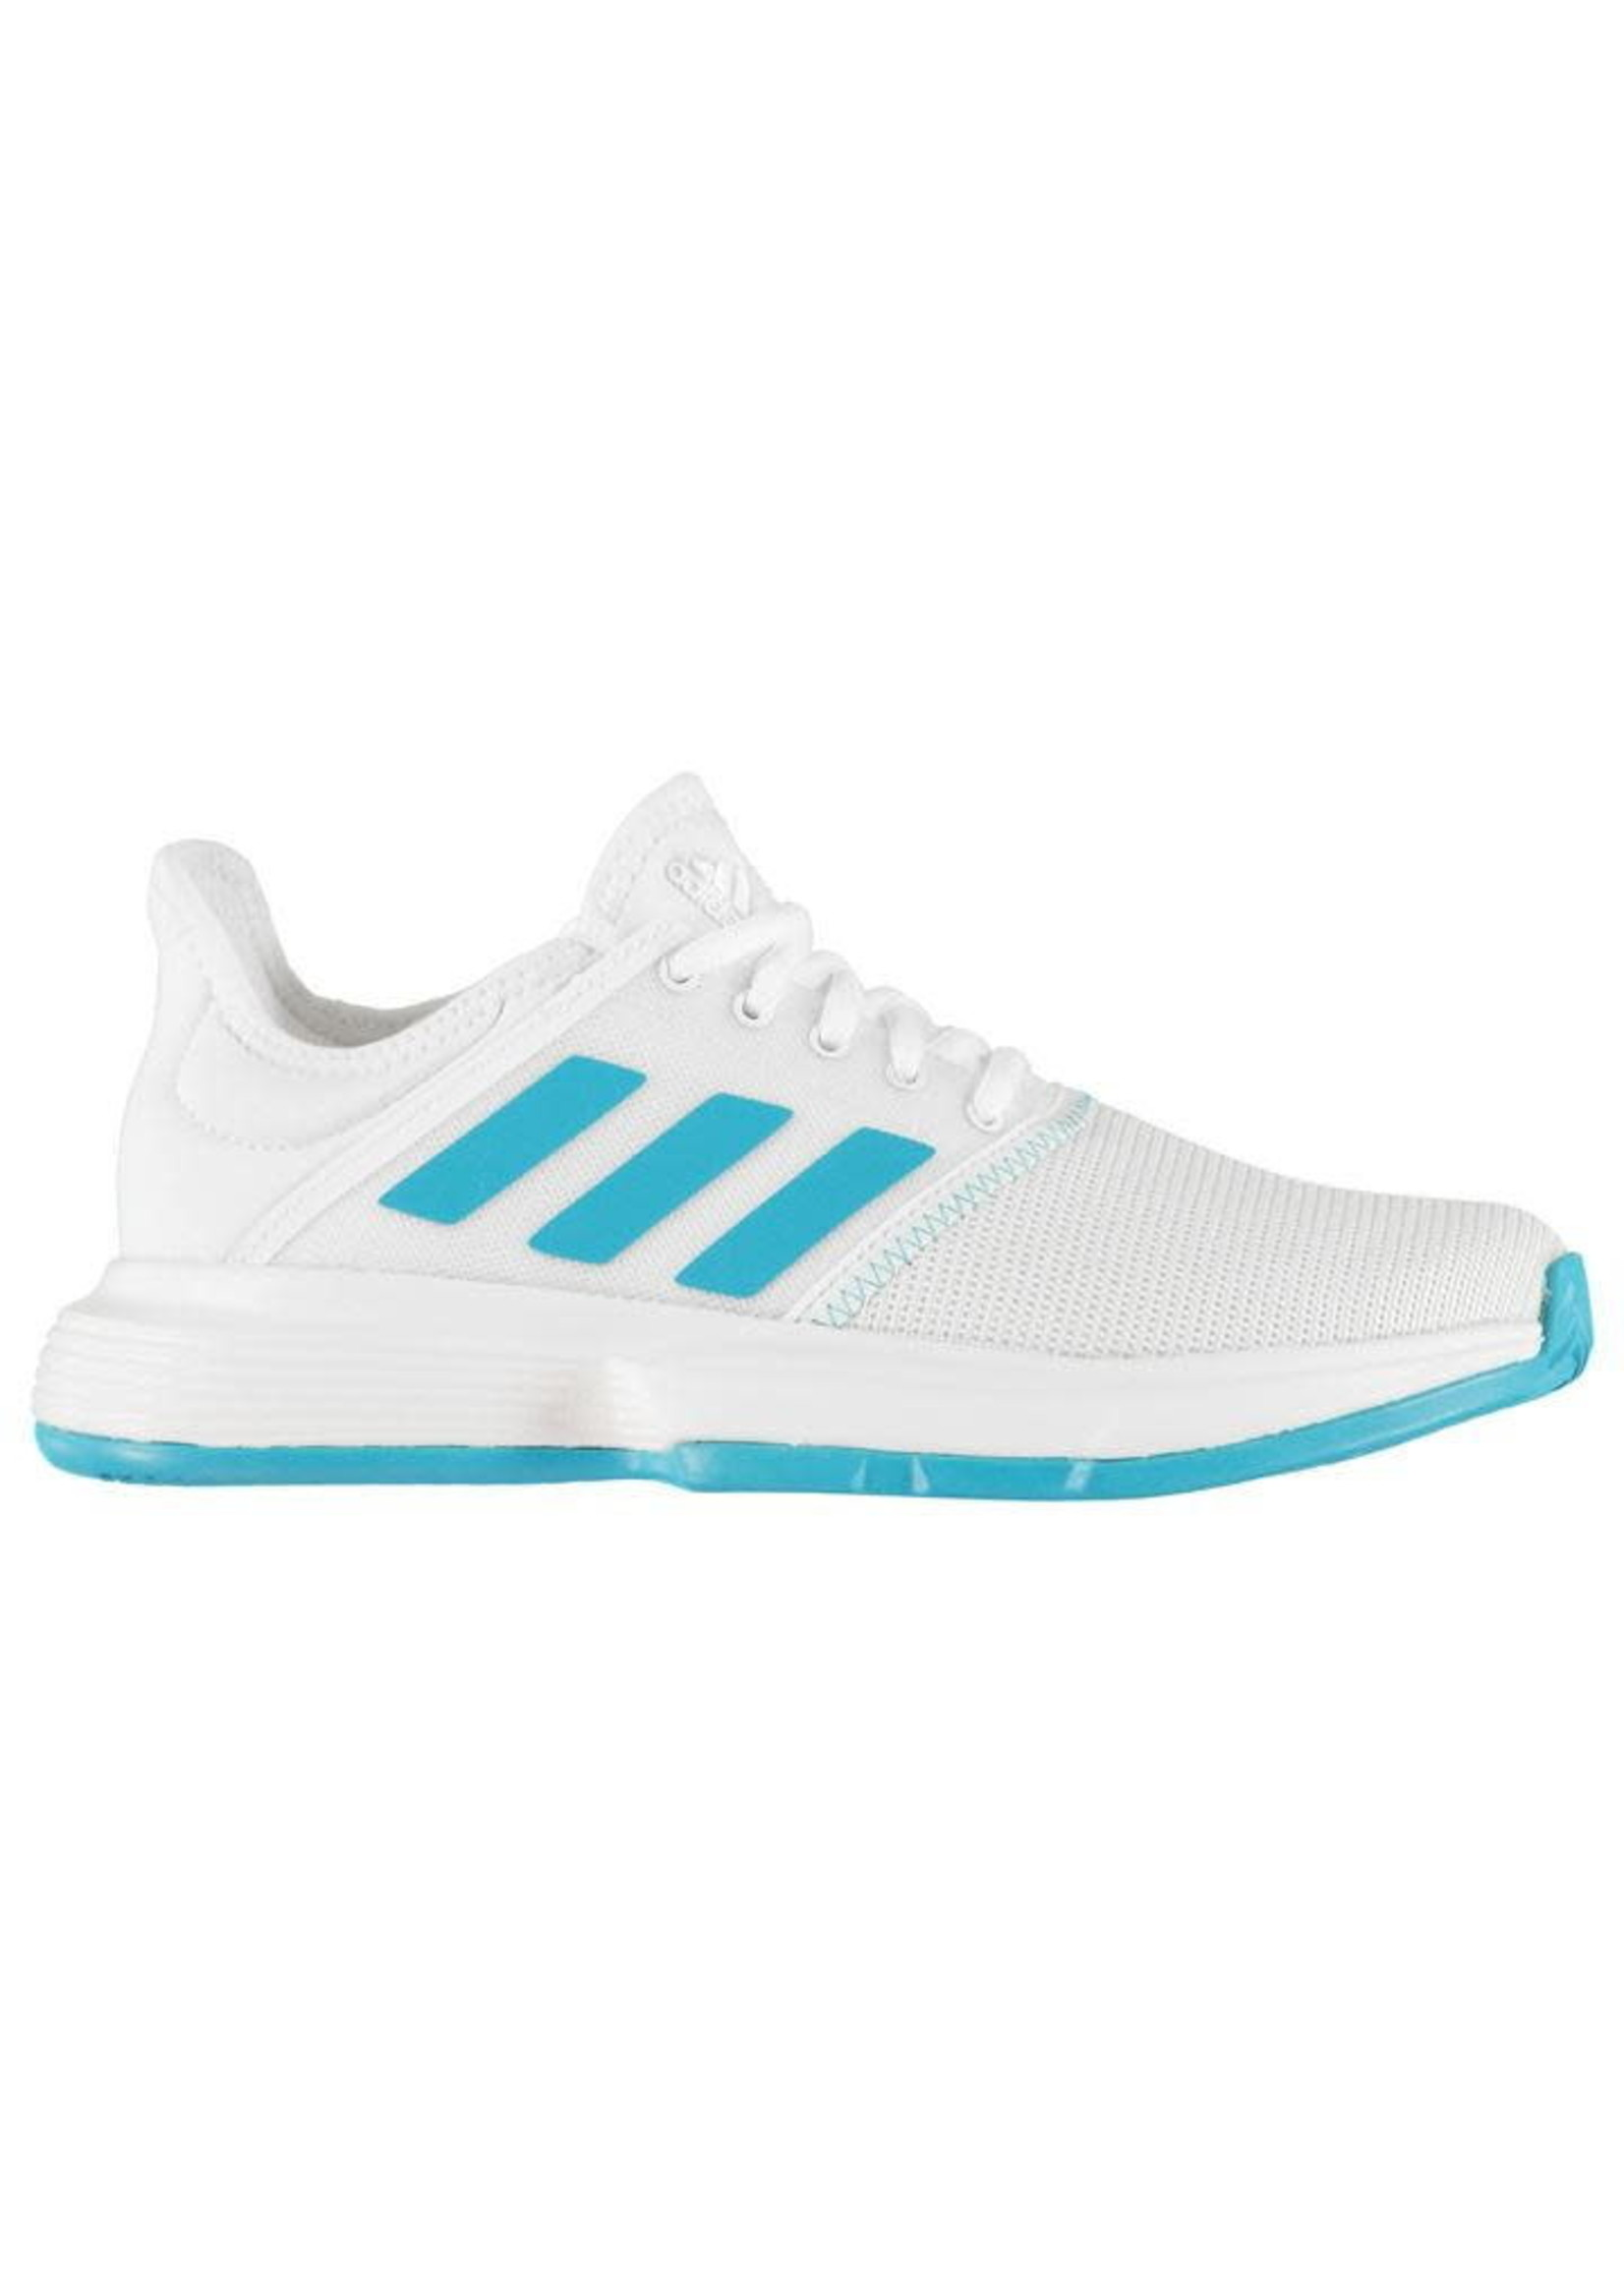 Adidas Adidas Game Court Ladies Tennis Shoes (2019)